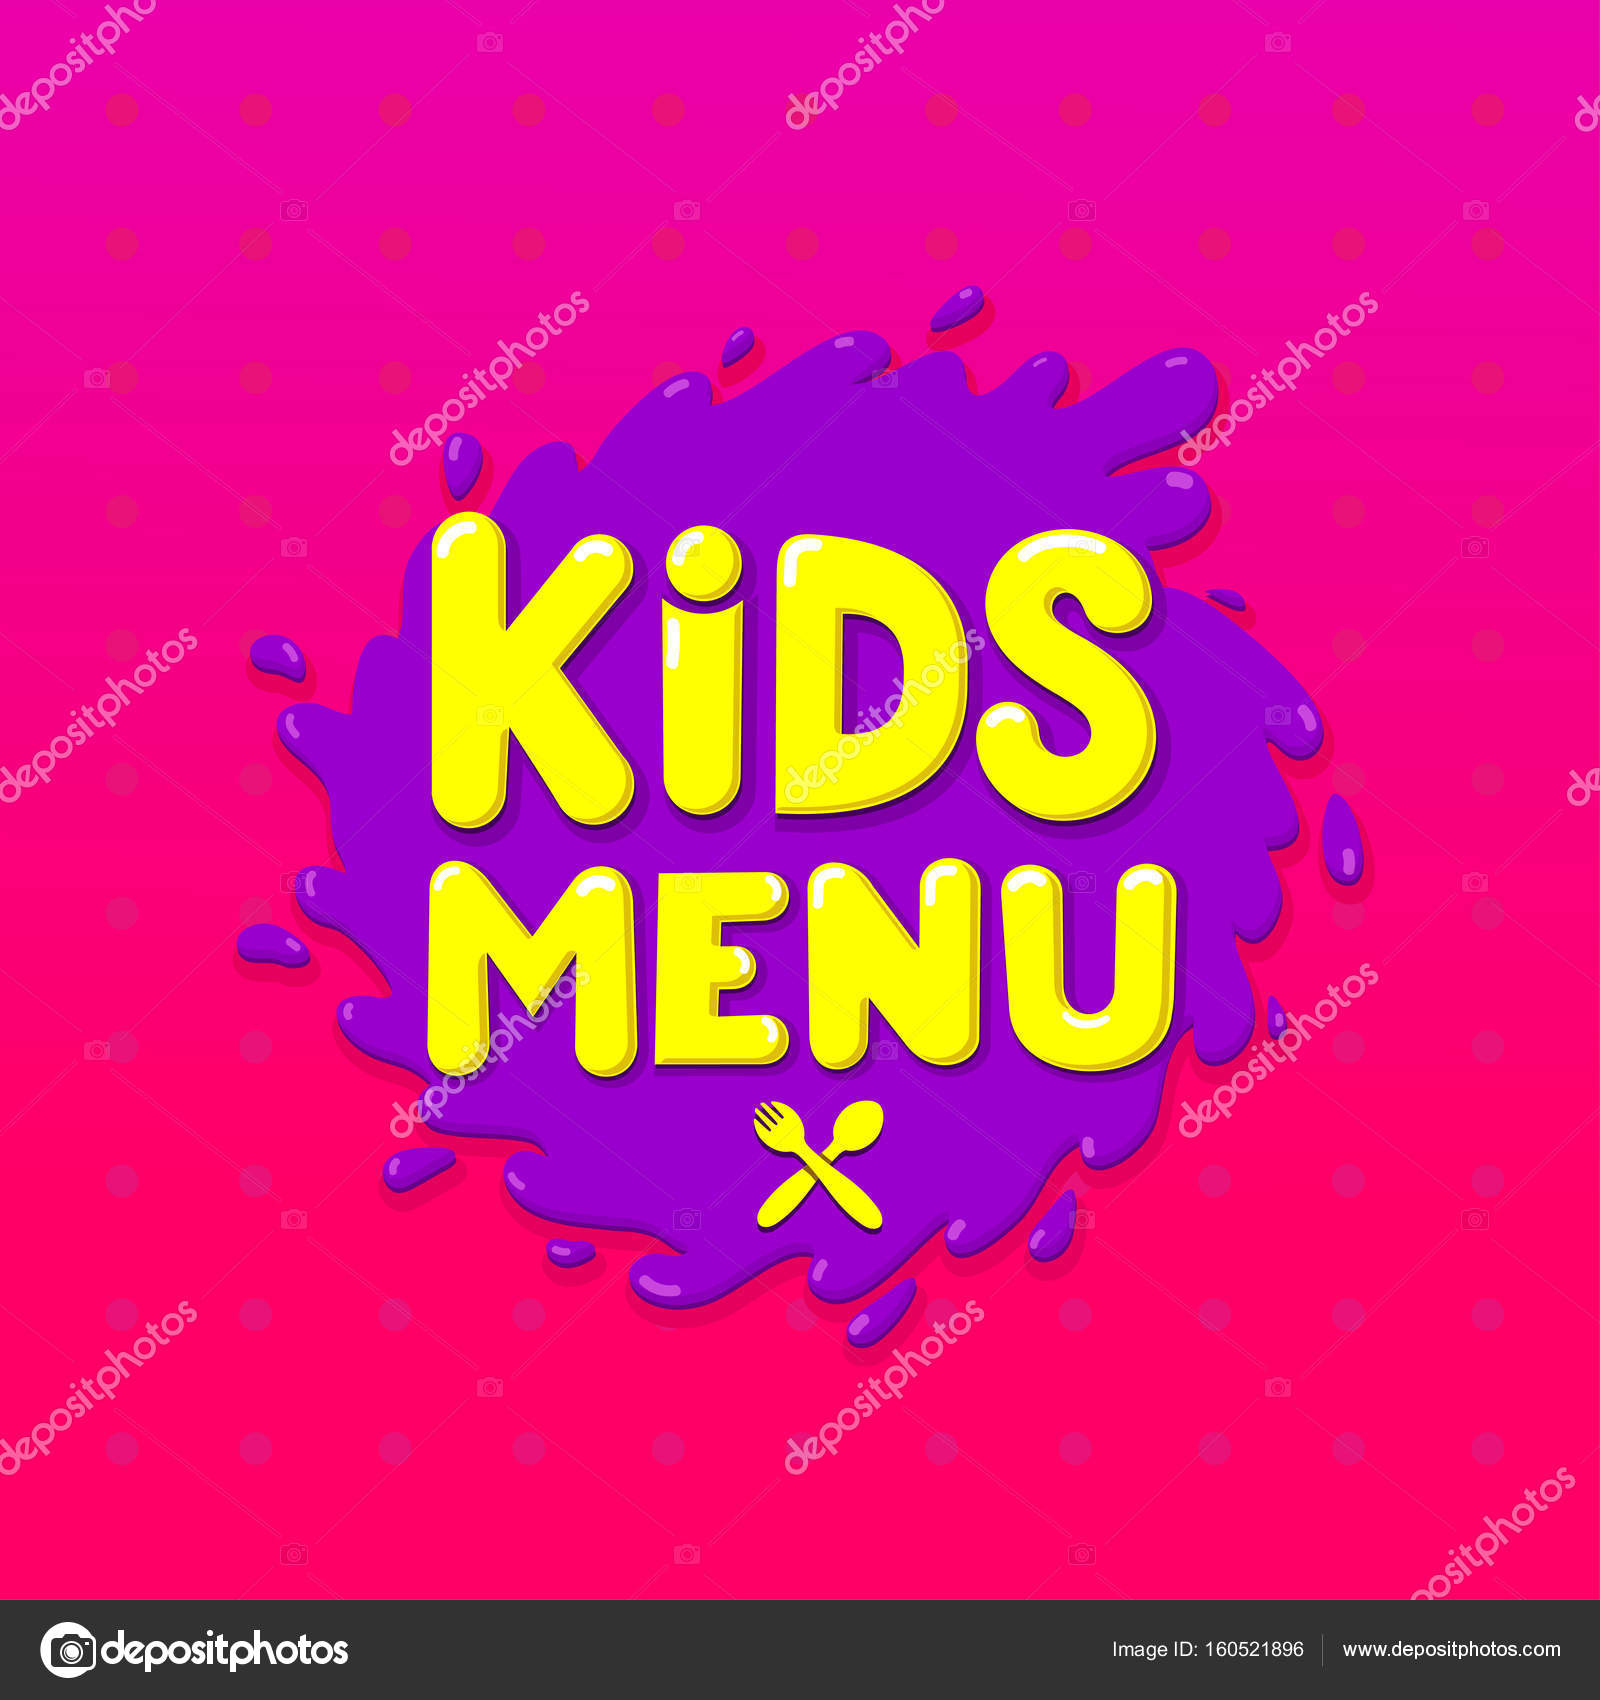 Kids Menu Banner Design Vector Illustration Isolated On Pink Background For Your